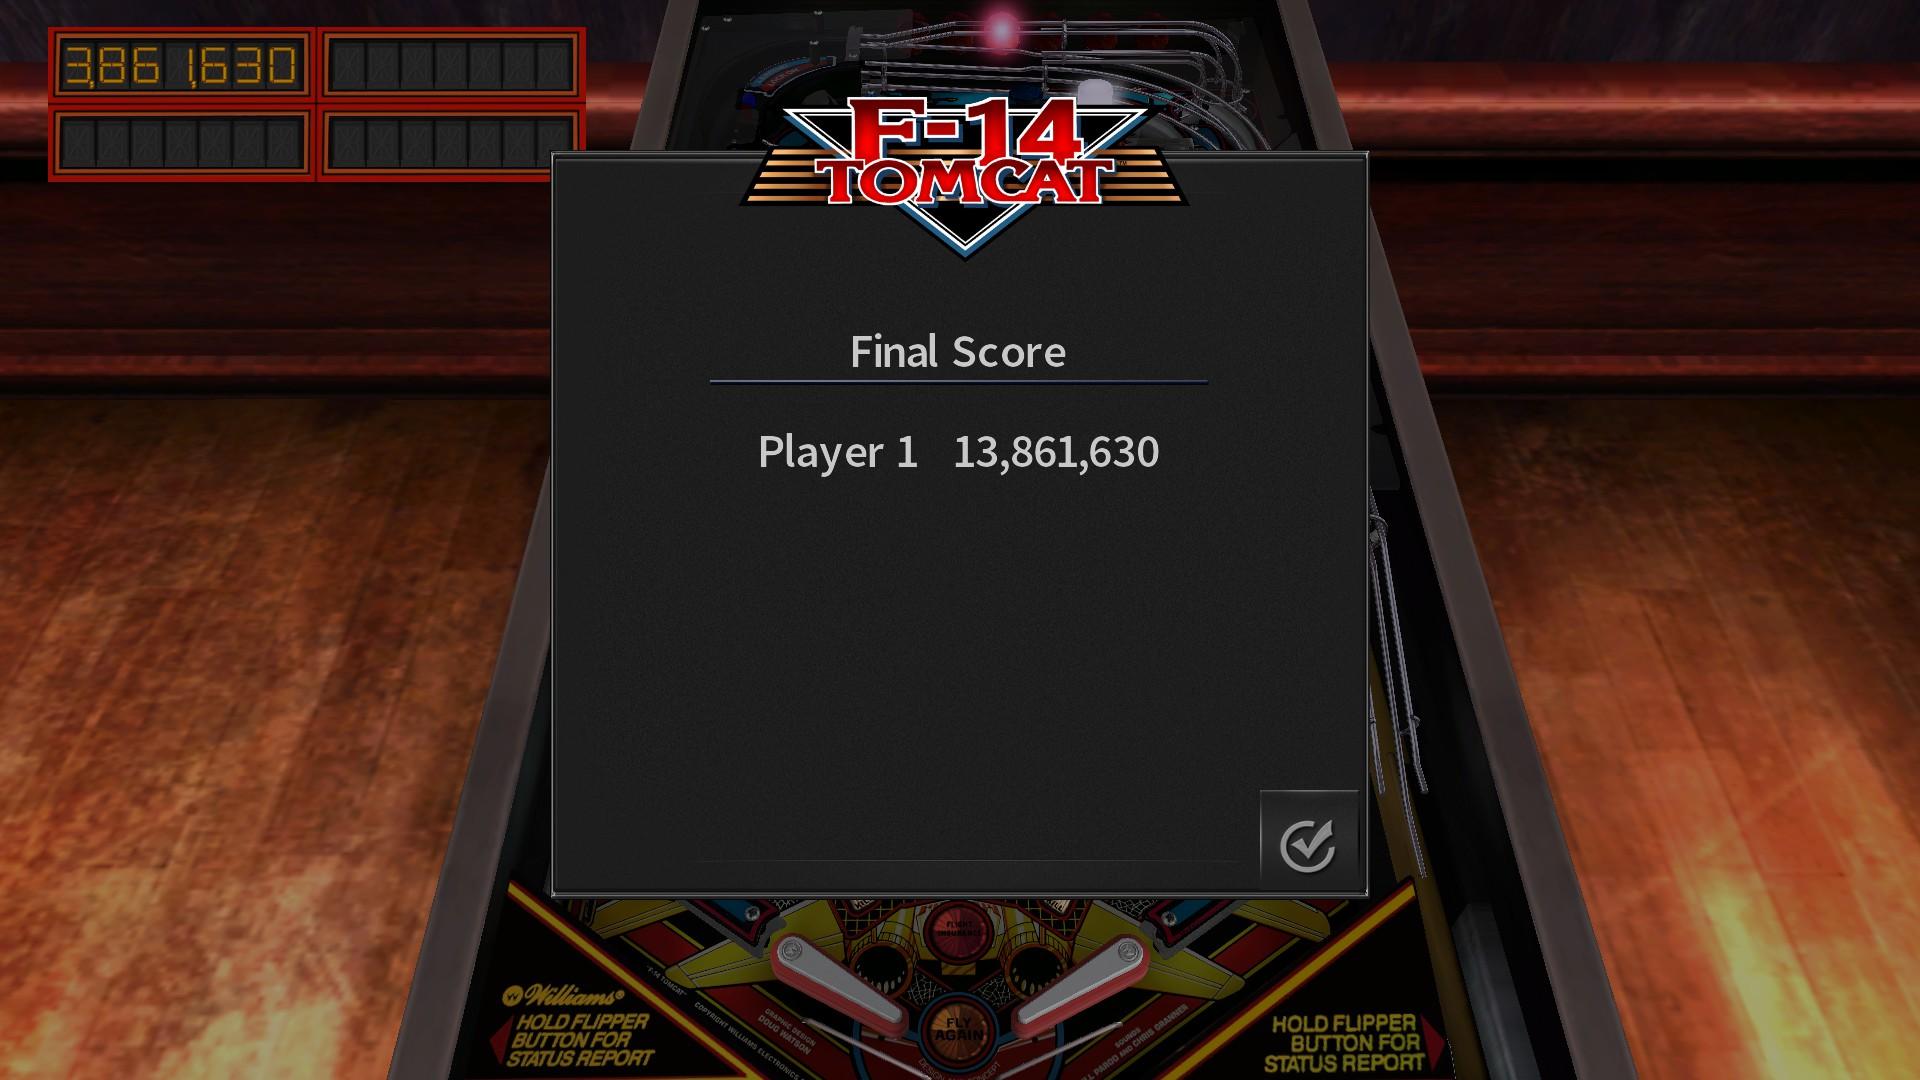 Mantalow: Pinball Arcade: F-14 Tomcat (PC) 13,861,630 points on 2016-11-20 08:21:26